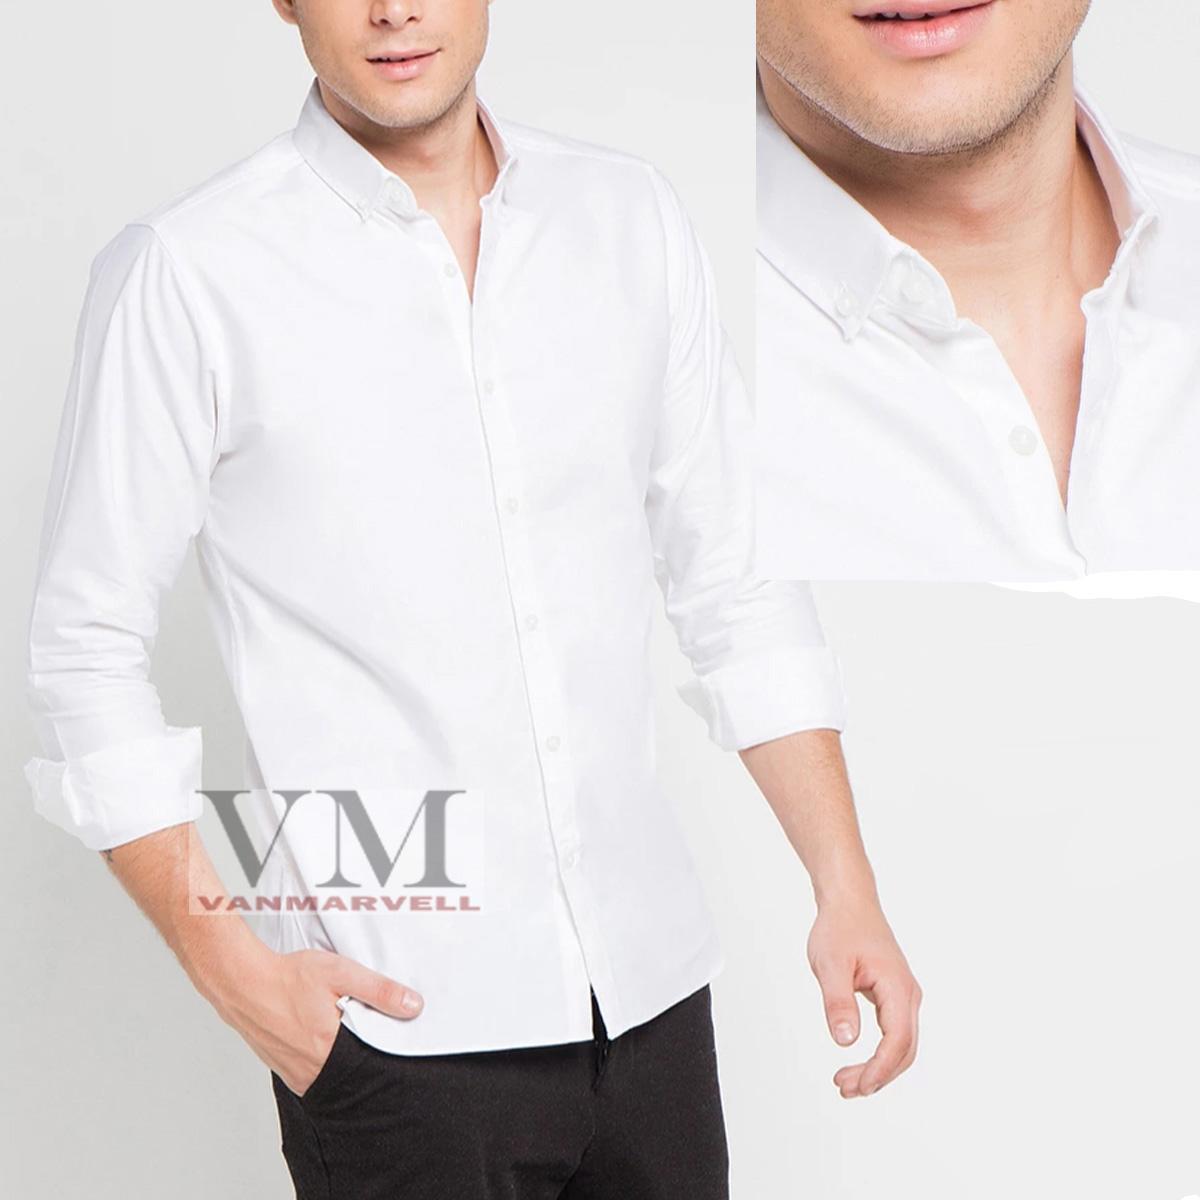 VM Kemeja Polos Putih Slimfit Panjang - Kancing leher